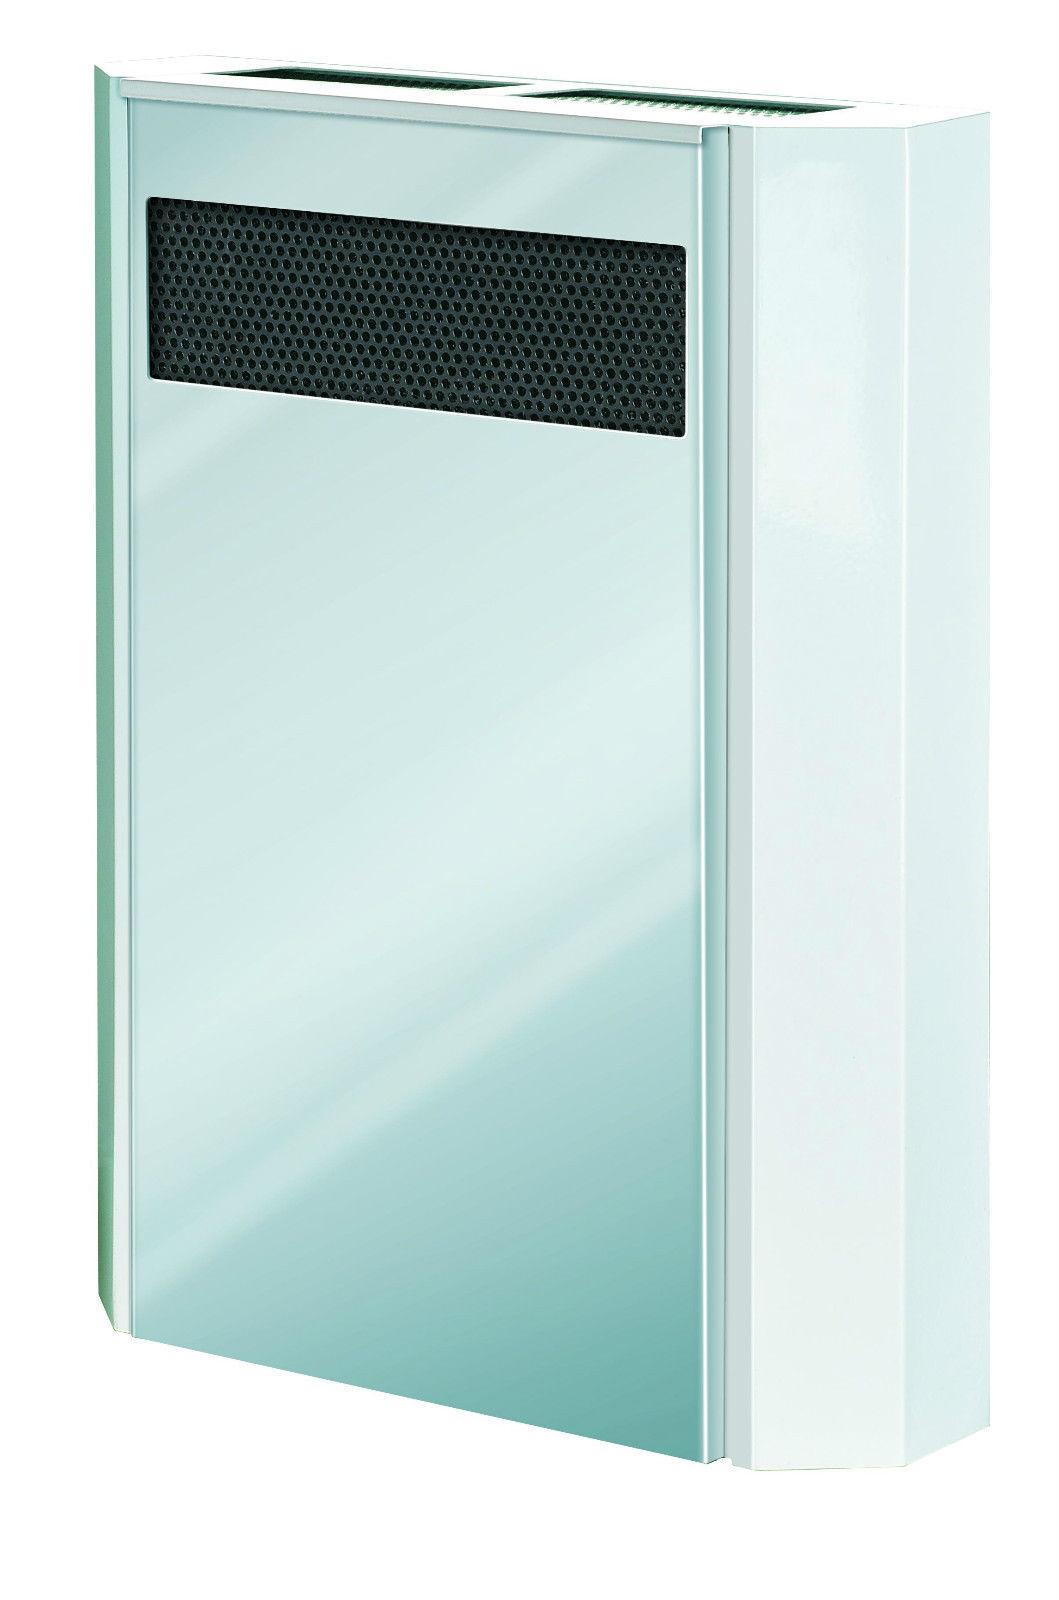 Lüftungsgerät Vents Micra 60 m³ bis 80% WRG KWL Lüftungsgeräte Wohnungslüftung